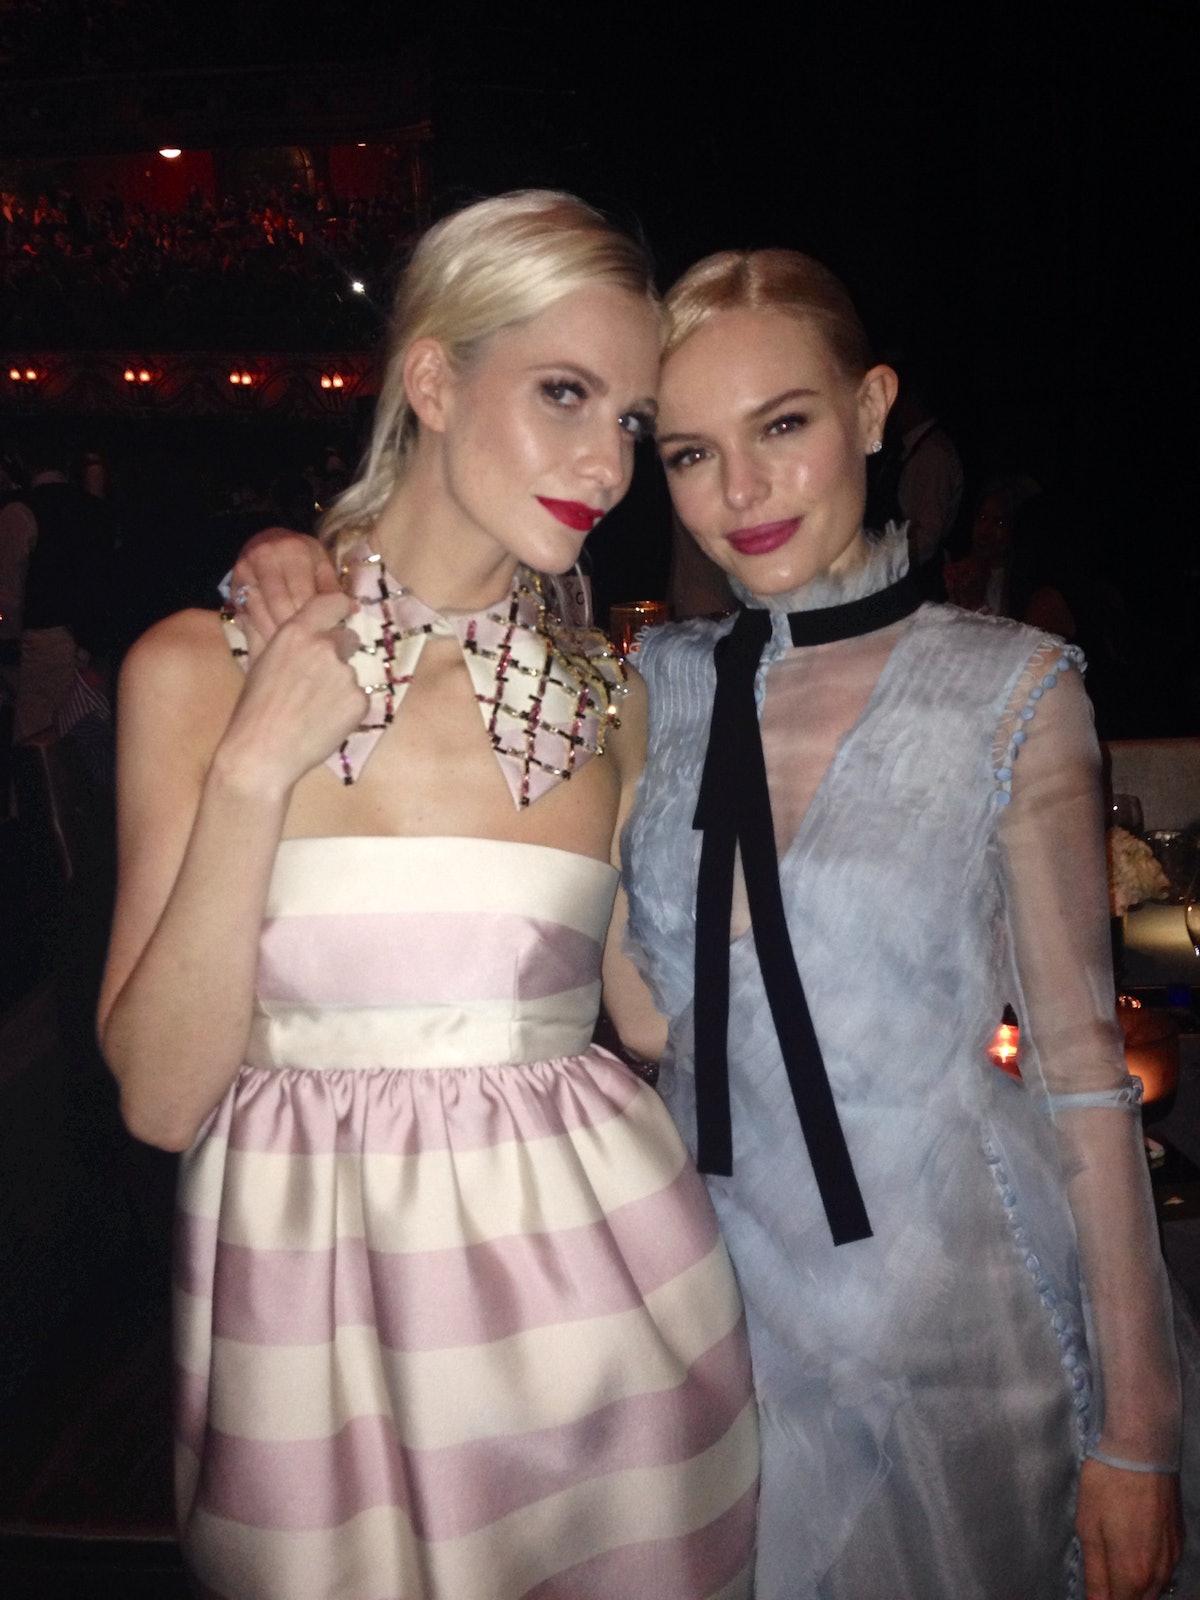 Winners for best Girlfriends of the night Poppy Delavingne (in Emilia Wickstead) and Kate Bosworth (in Erdem)